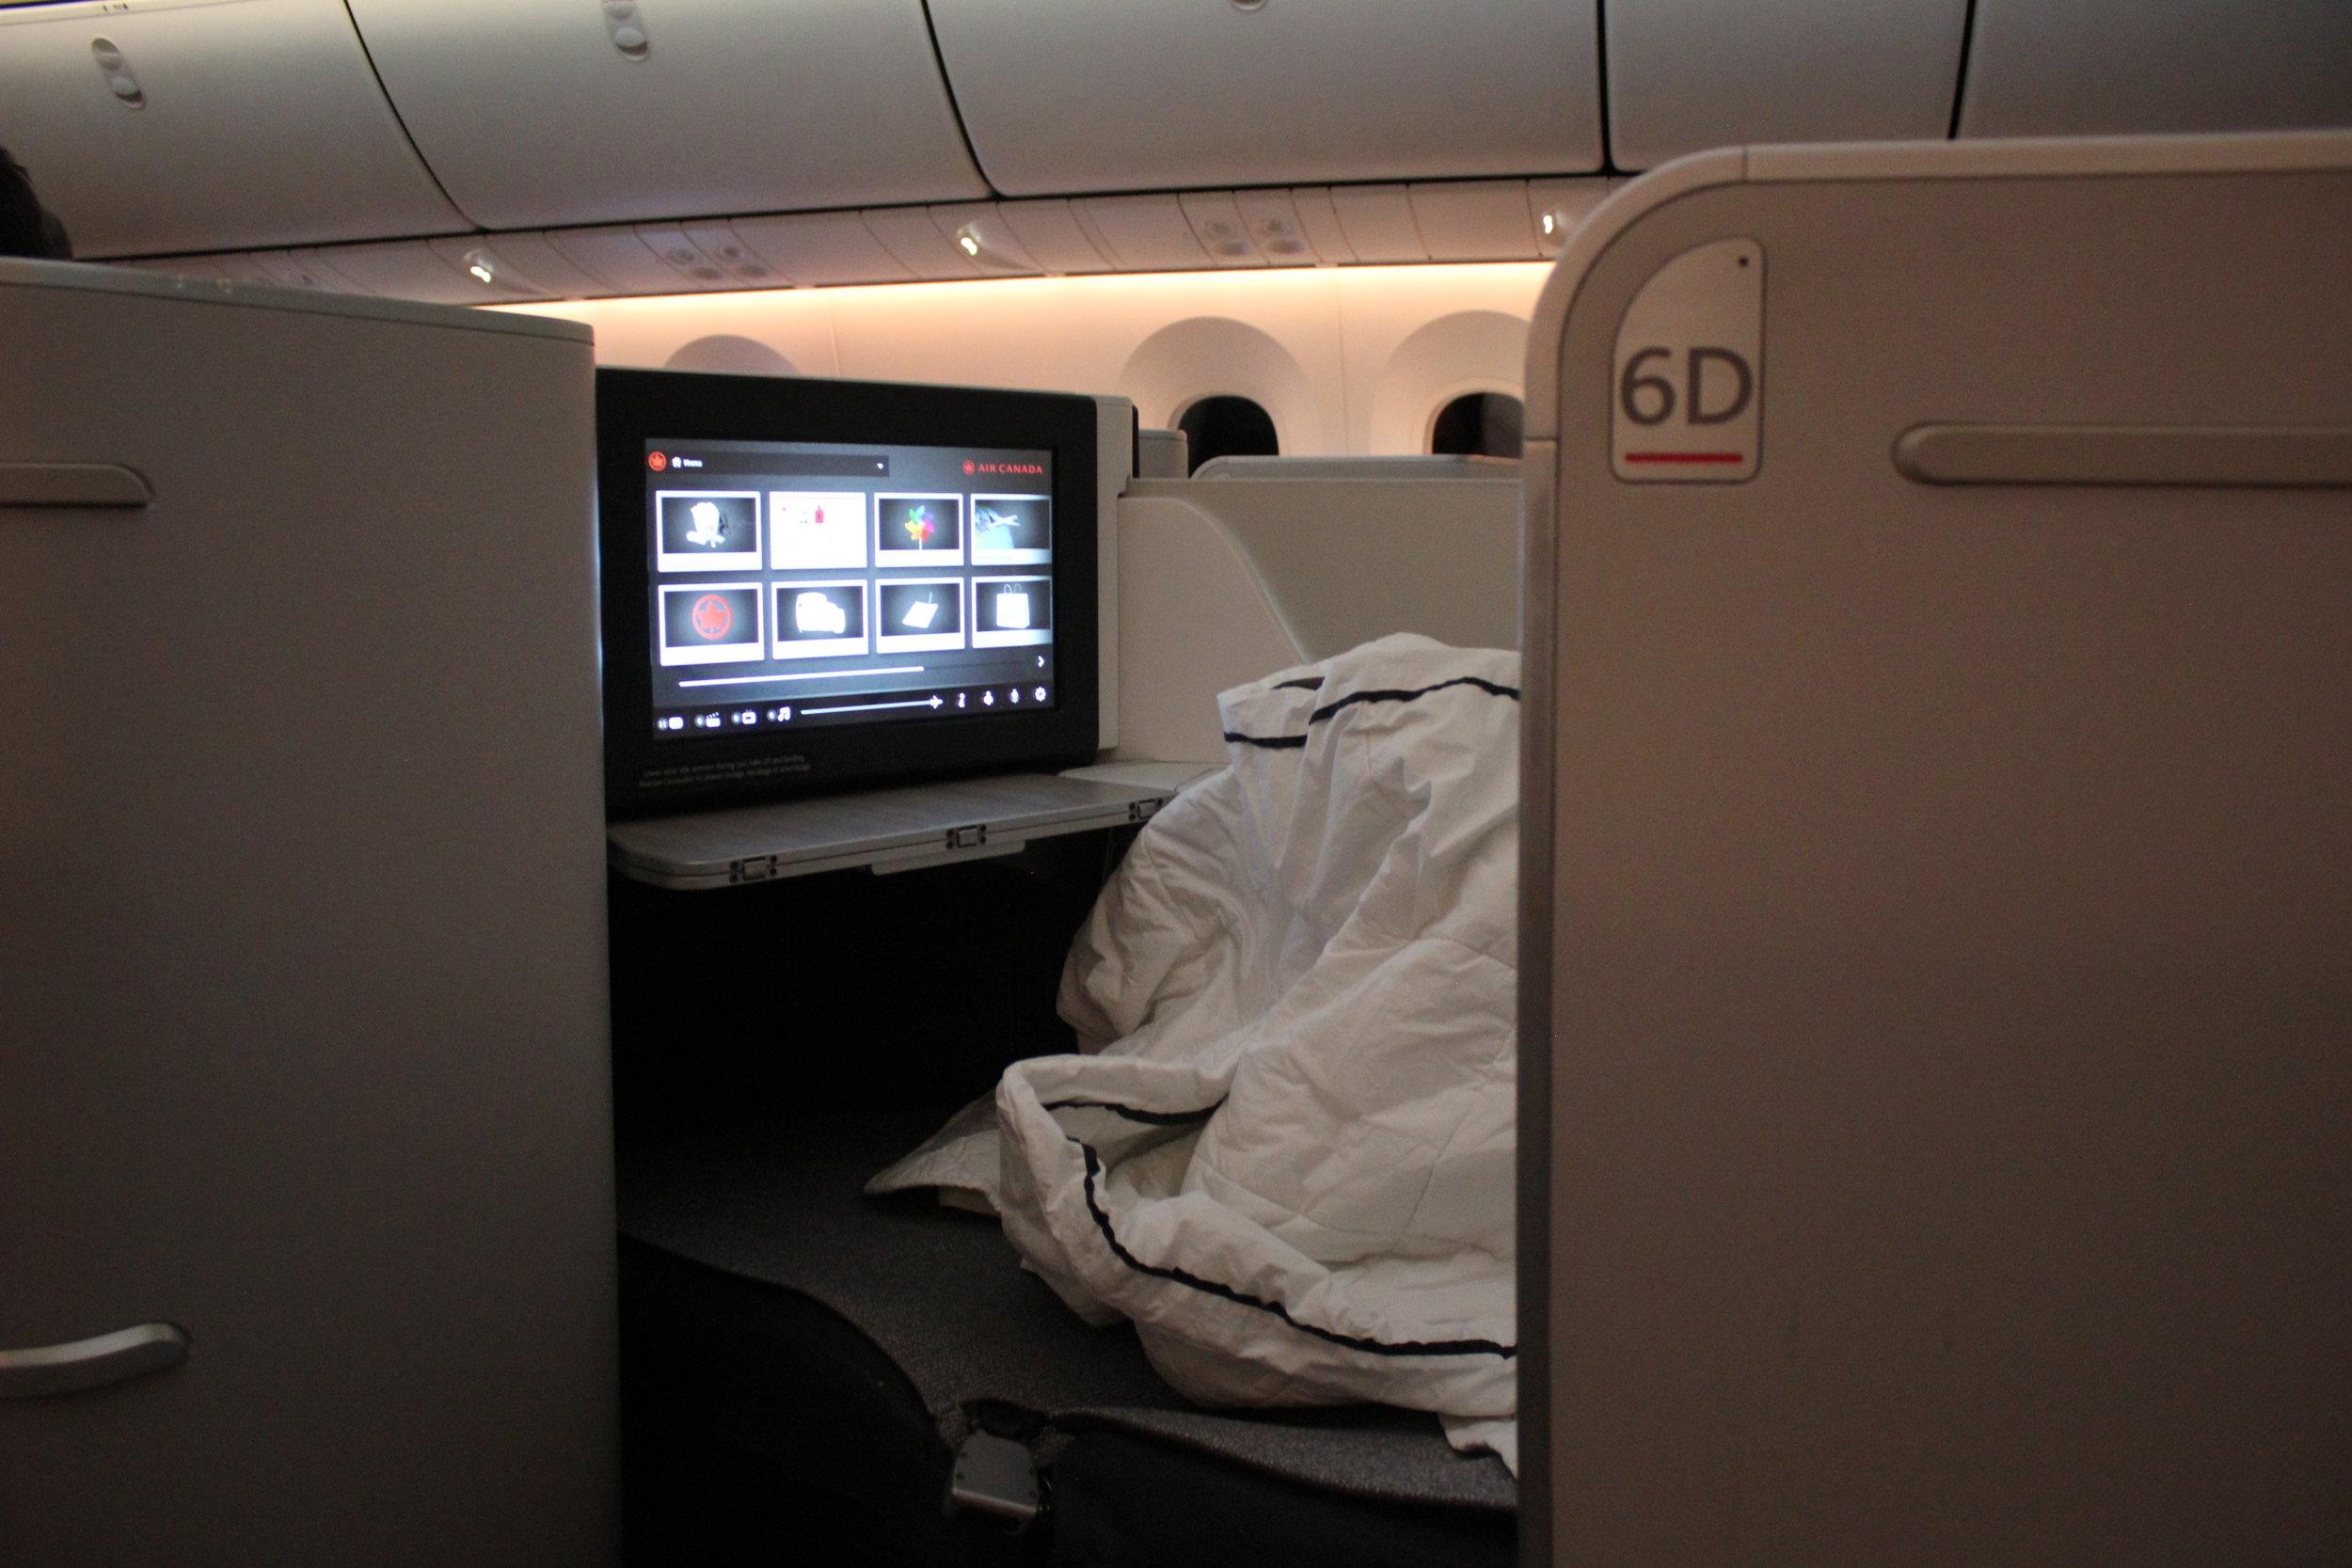 Air Canada business class – Seat 6D